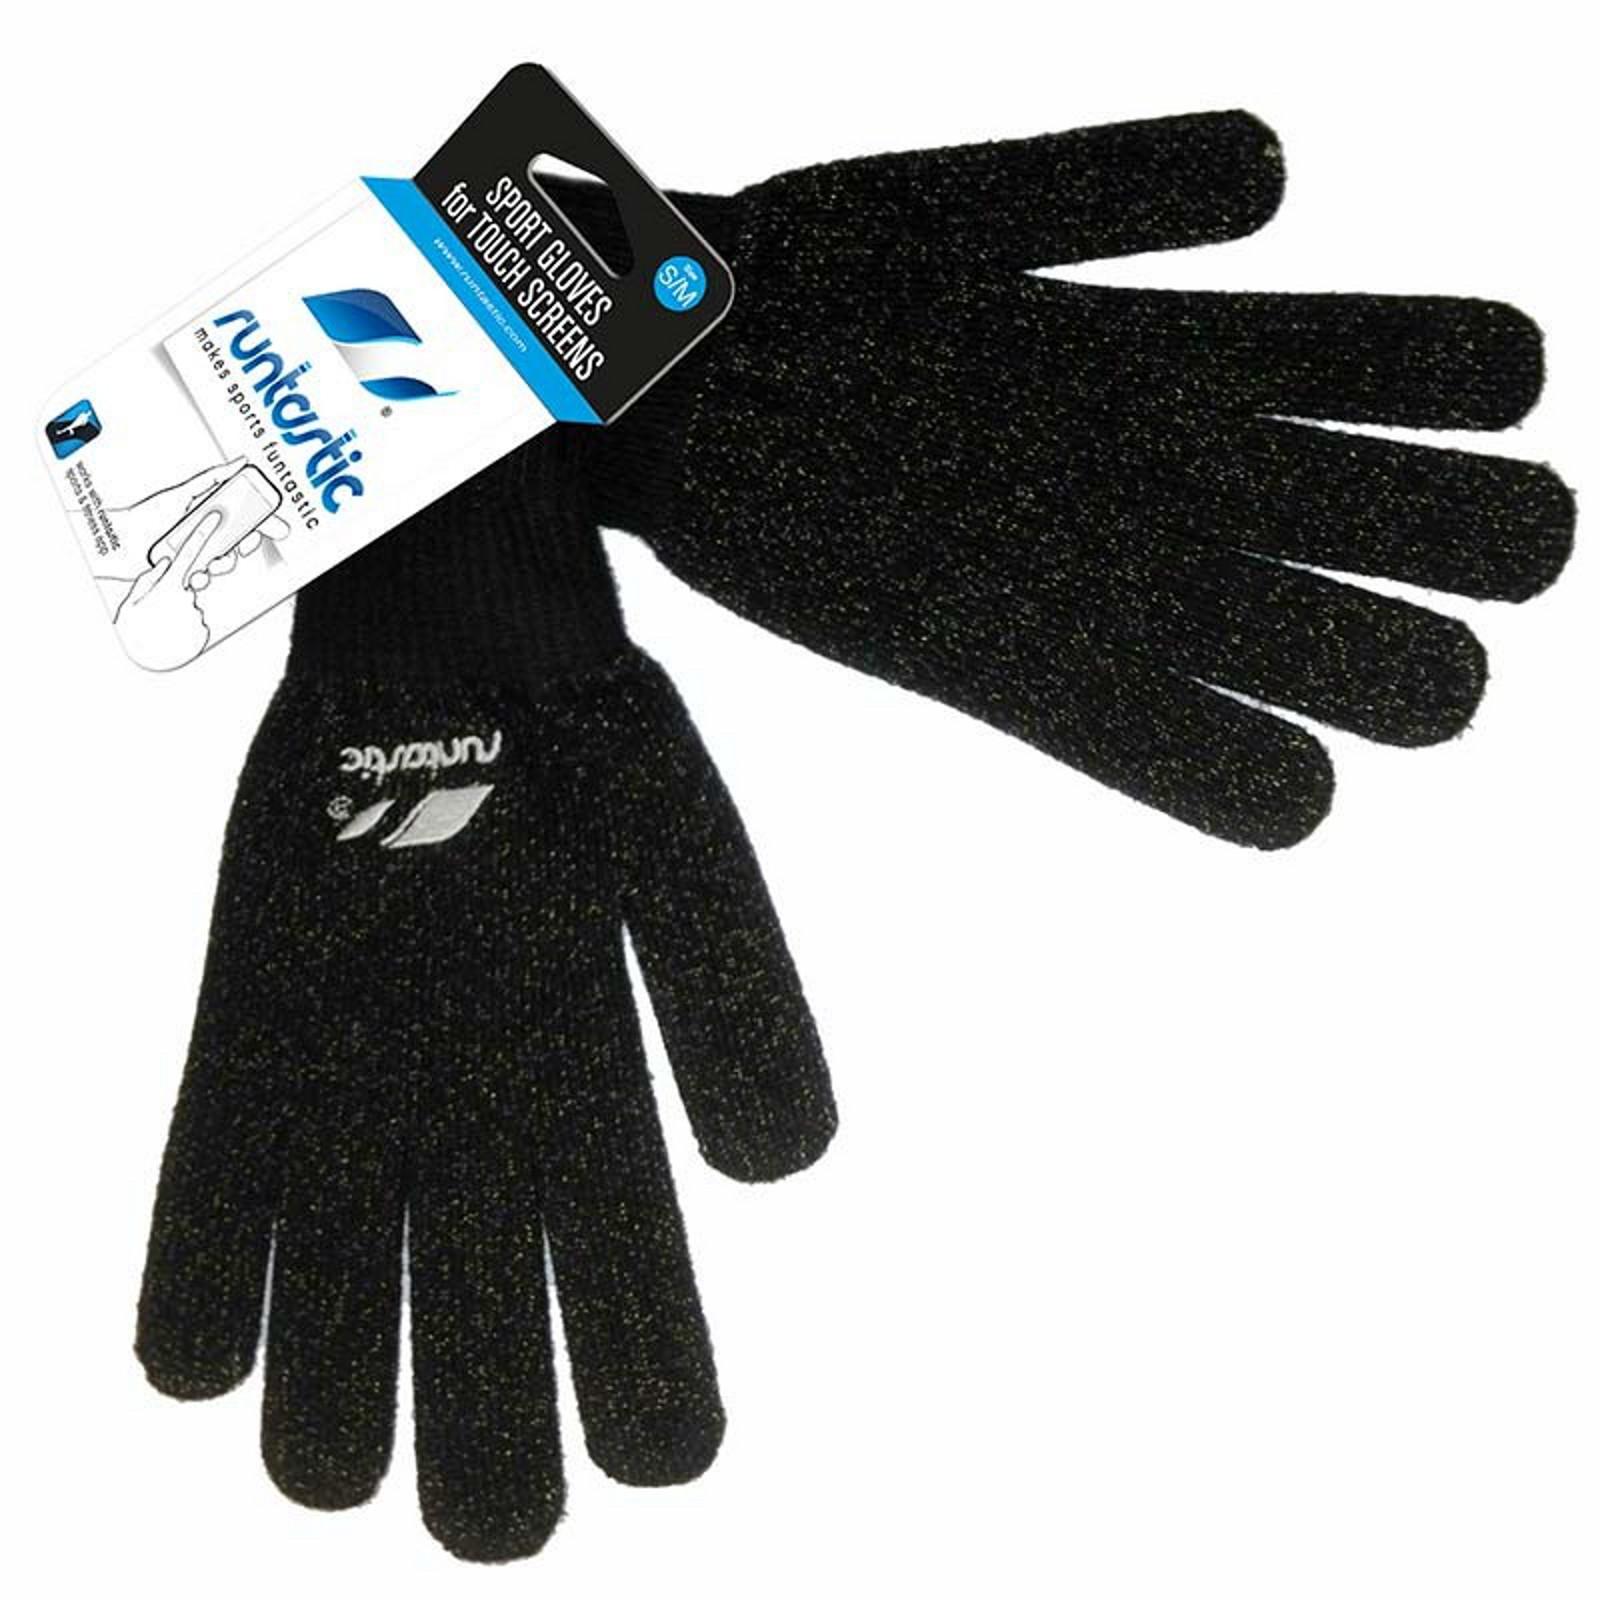 gants de sport runtastic pour smartphones t fitness. Black Bedroom Furniture Sets. Home Design Ideas